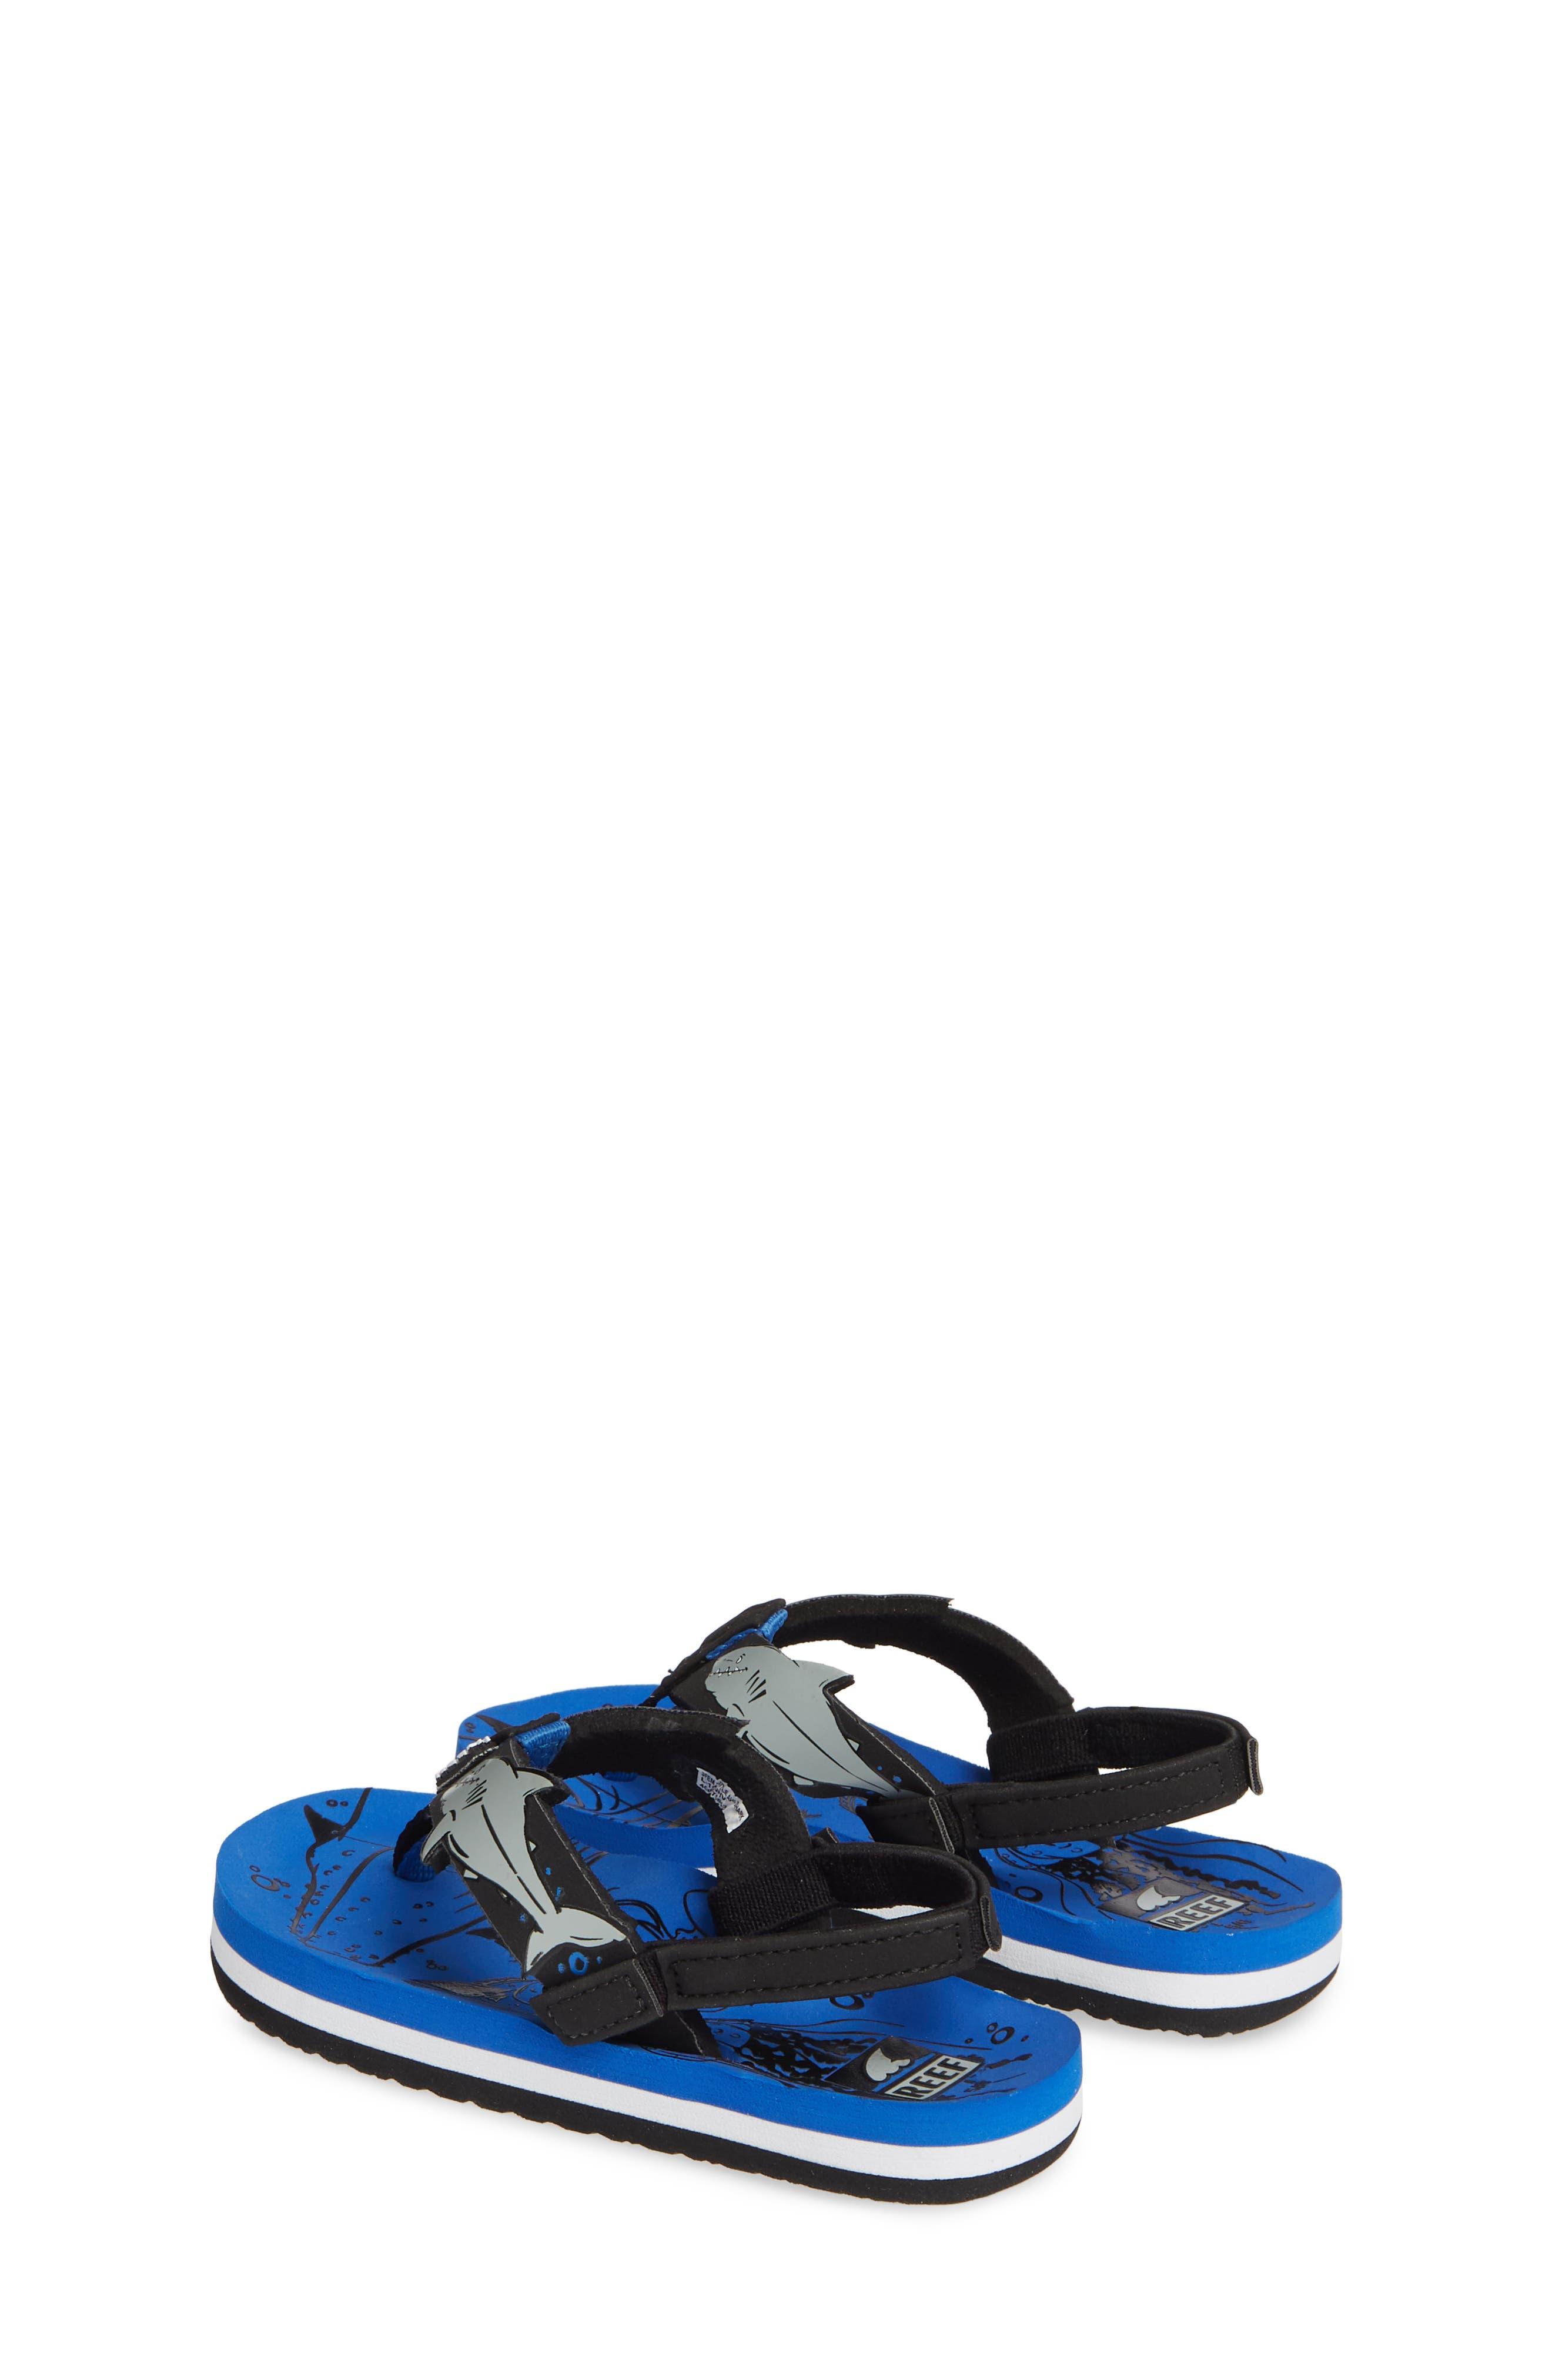 REEF, Ahi Shark Flip Flop, Alternate thumbnail 3, color, BLUE